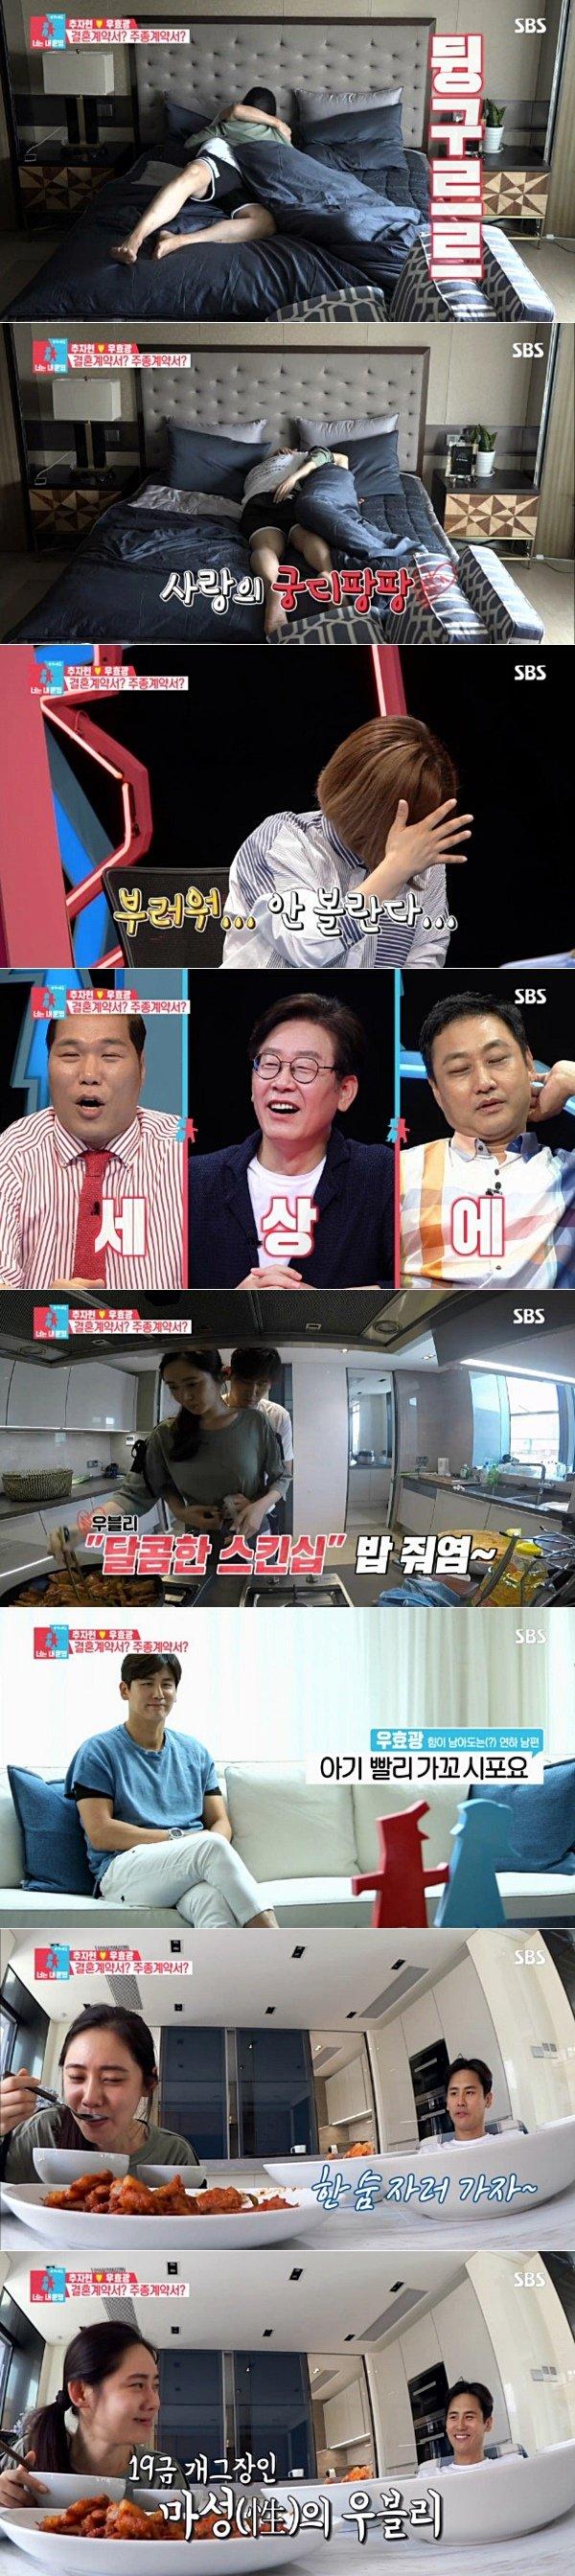 [TV엣지]}'동상이몽2' 추자현♥우효광, 달달 스킨십 영상 100만 뷰 돌파